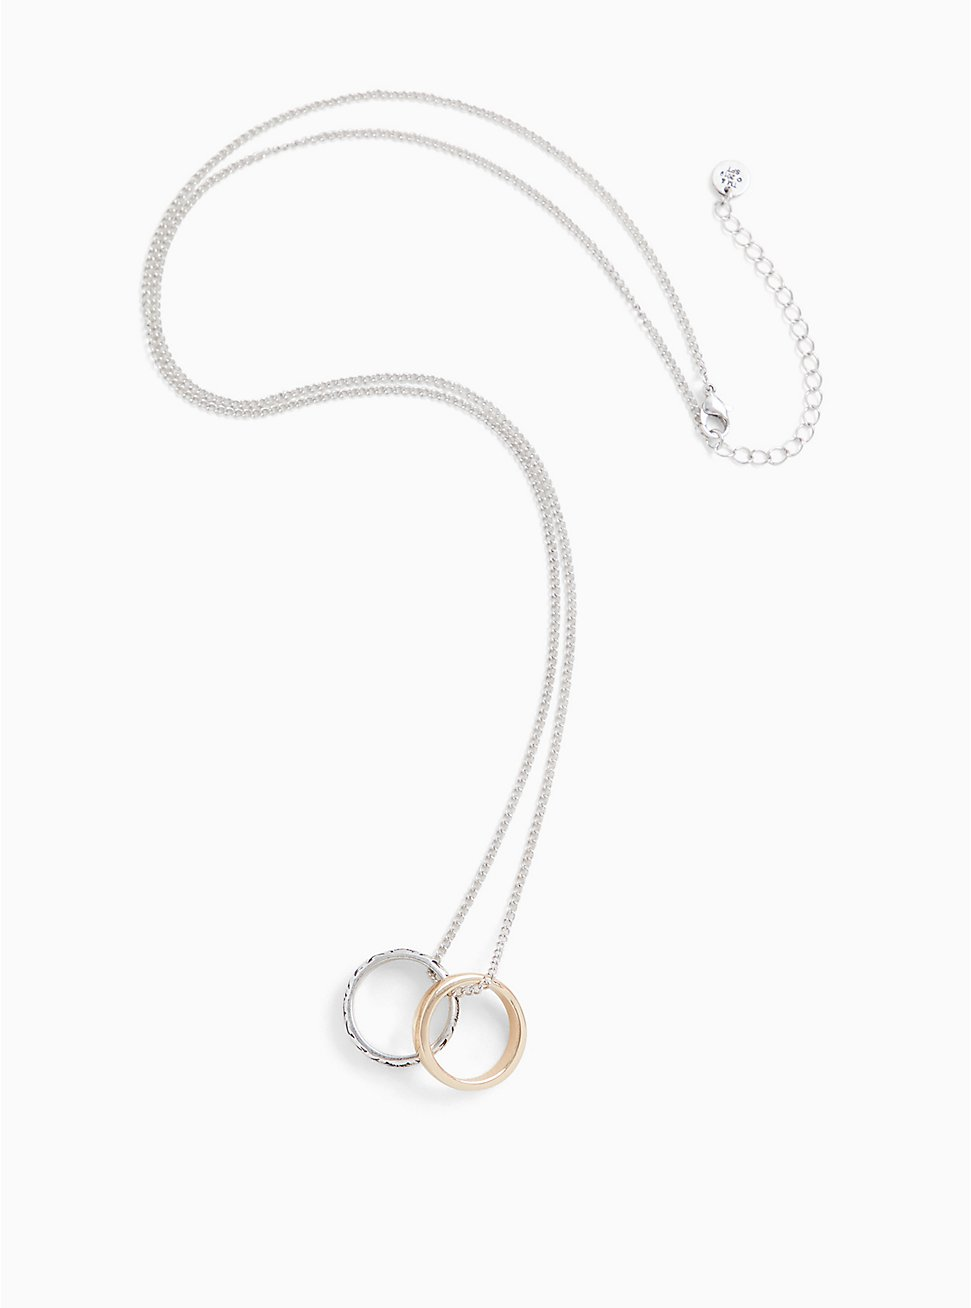 Outlander Claire Silver-Tone Wedding Rings Necklace, , hi-res